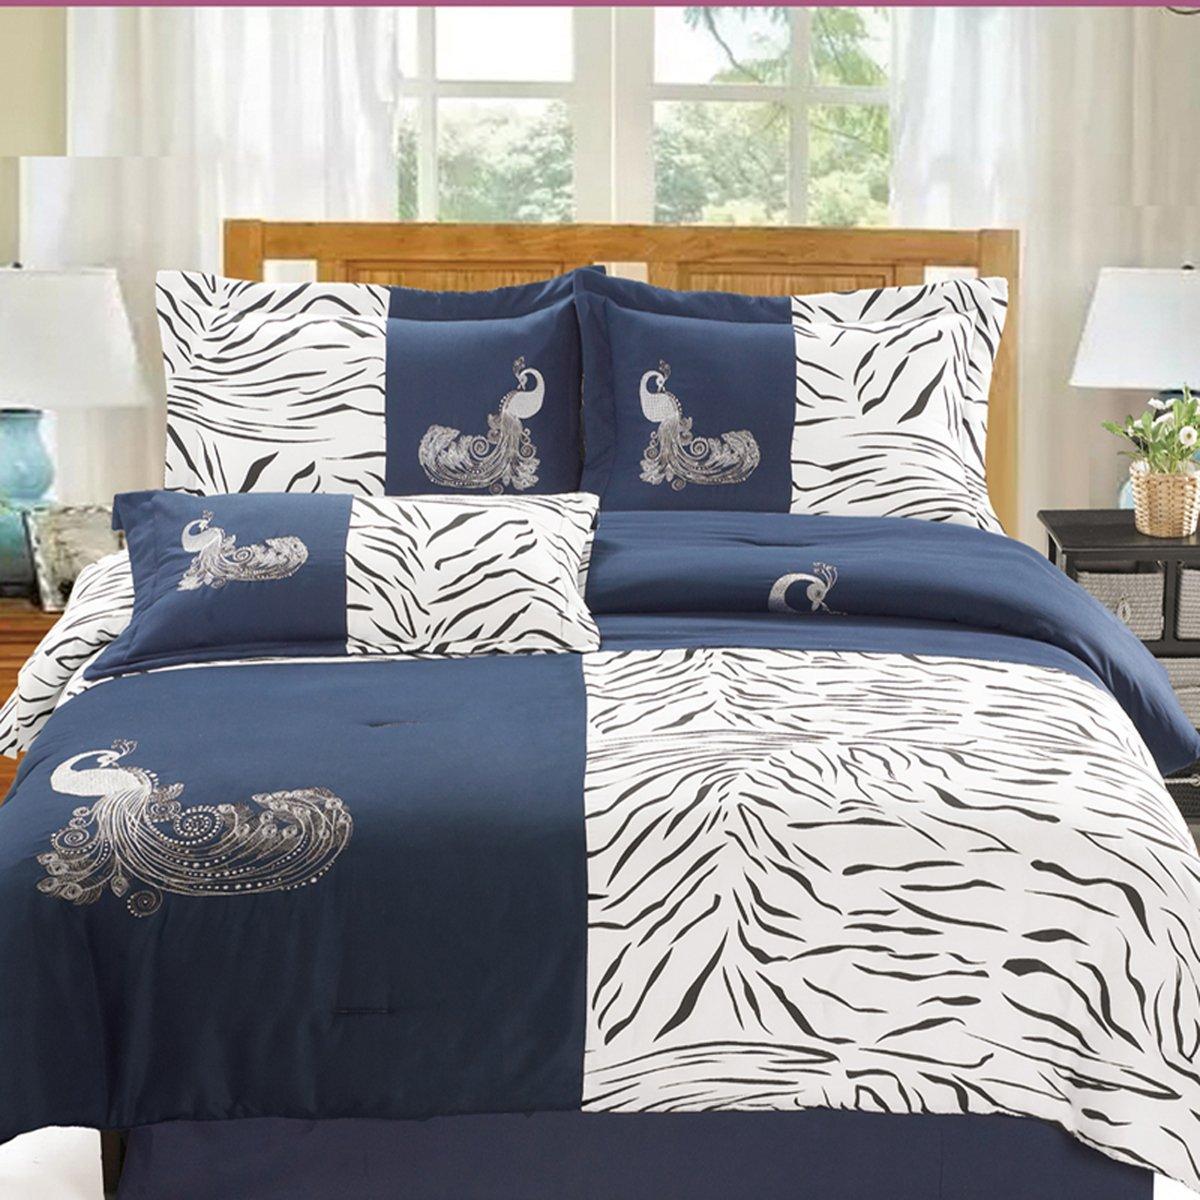 Dovedote Embroidery Animal Print Comforter Set, 5 Pieces